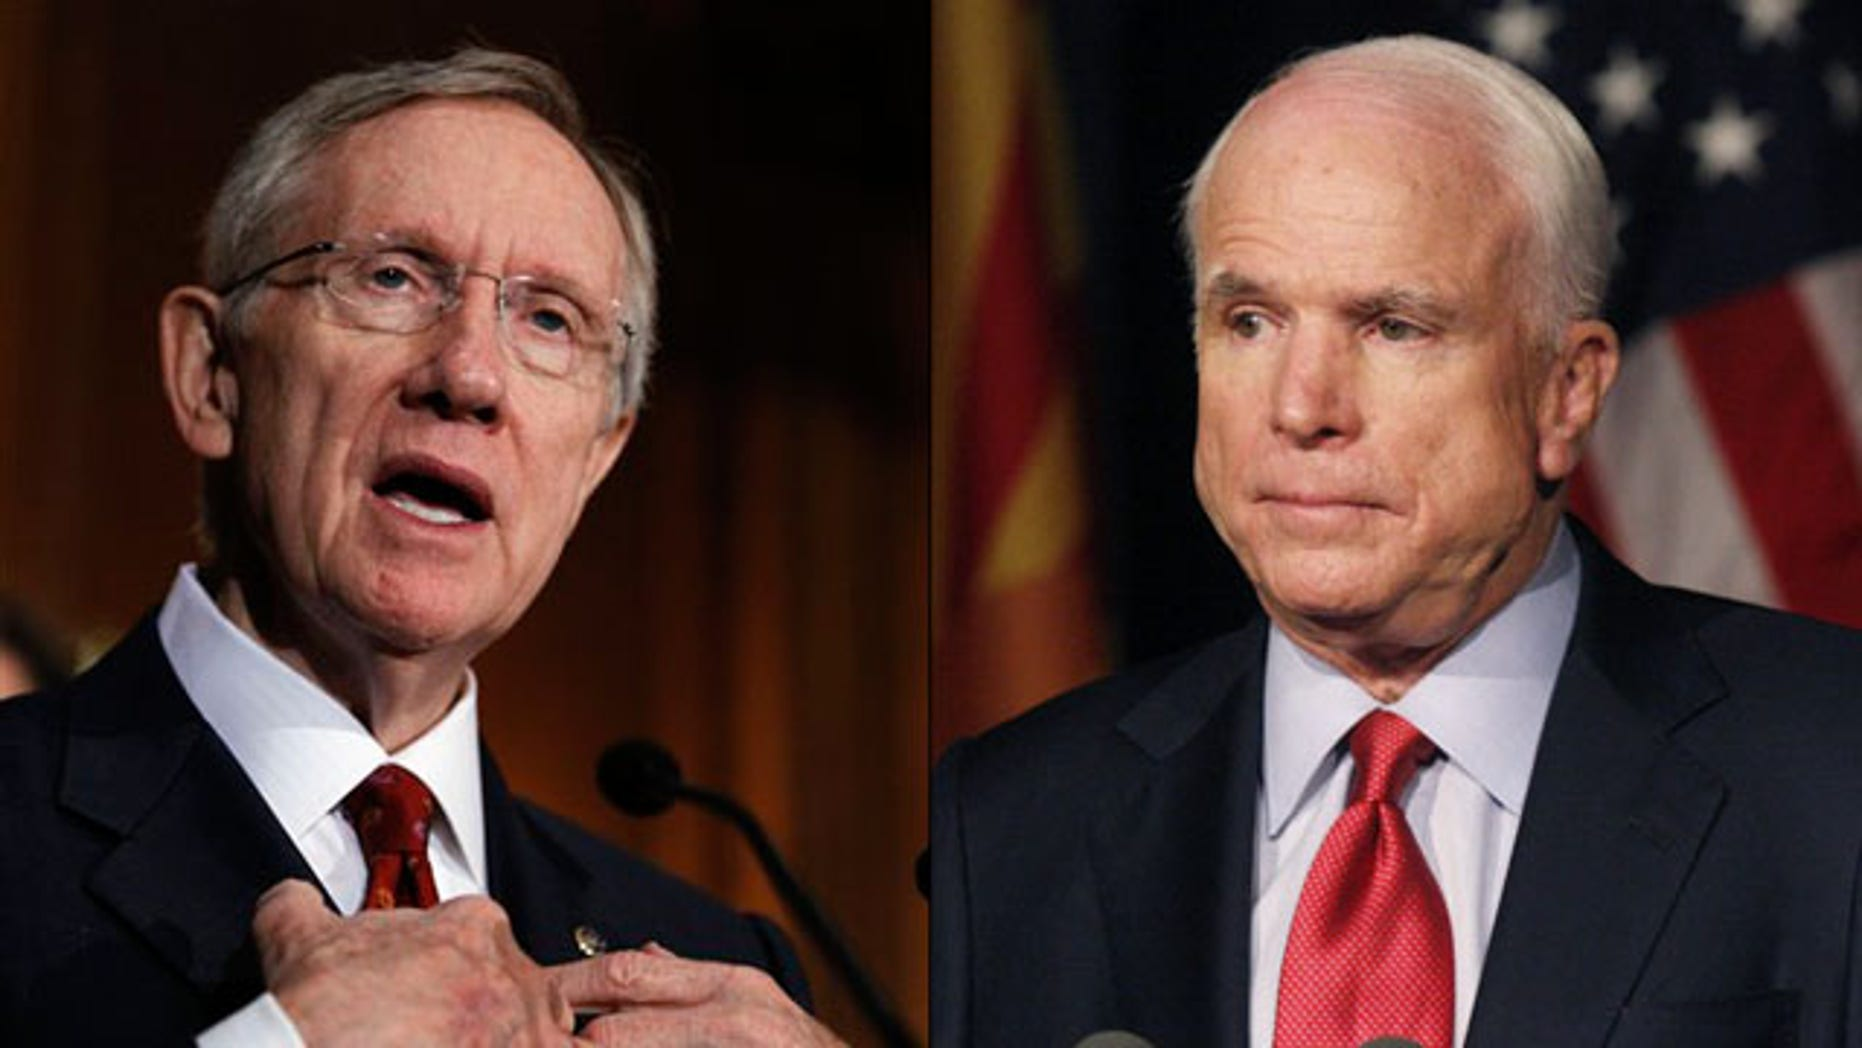 Shown here are Senate Majority Leader Harry Reid, left, and Sen. John McCain. (AP/Reuters Photos)